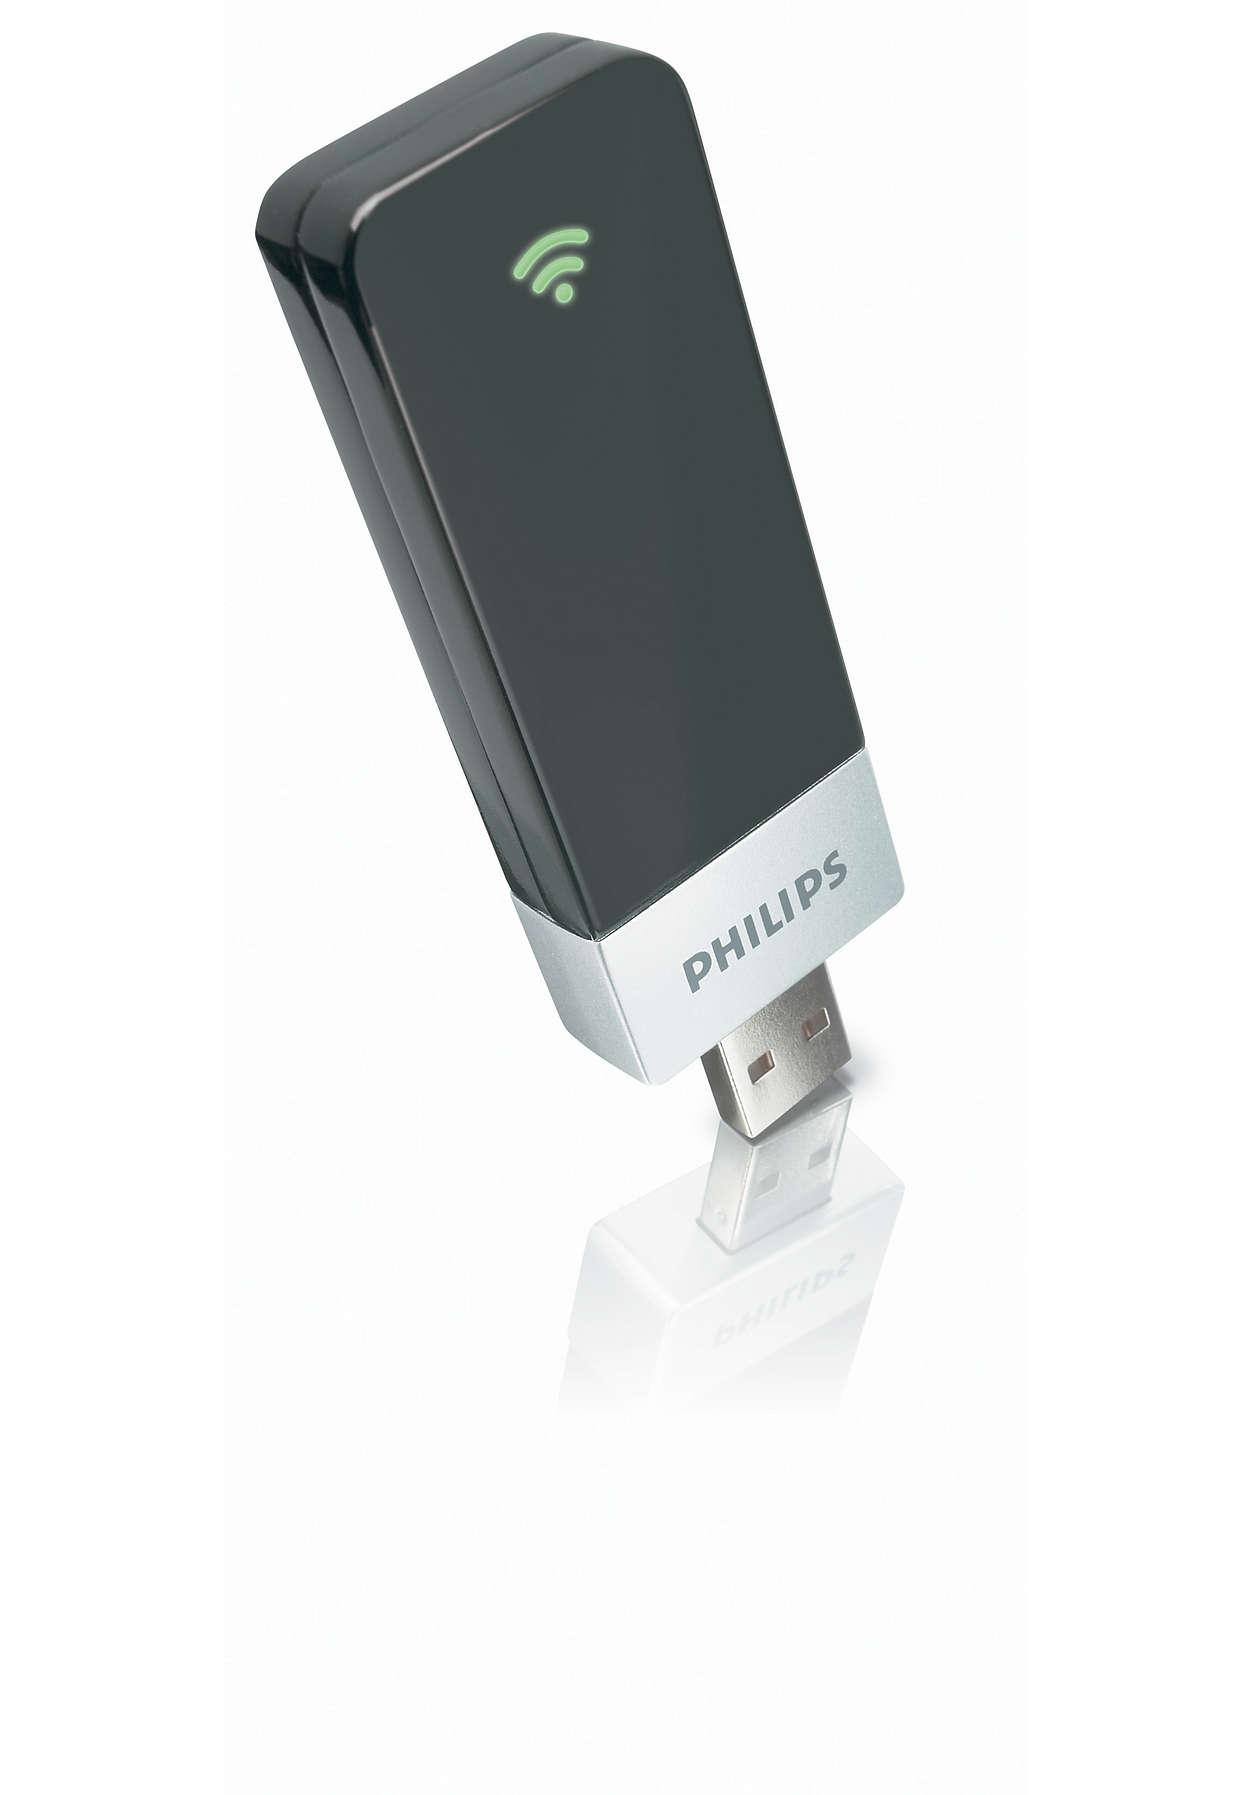 Trådløs USB-adapter